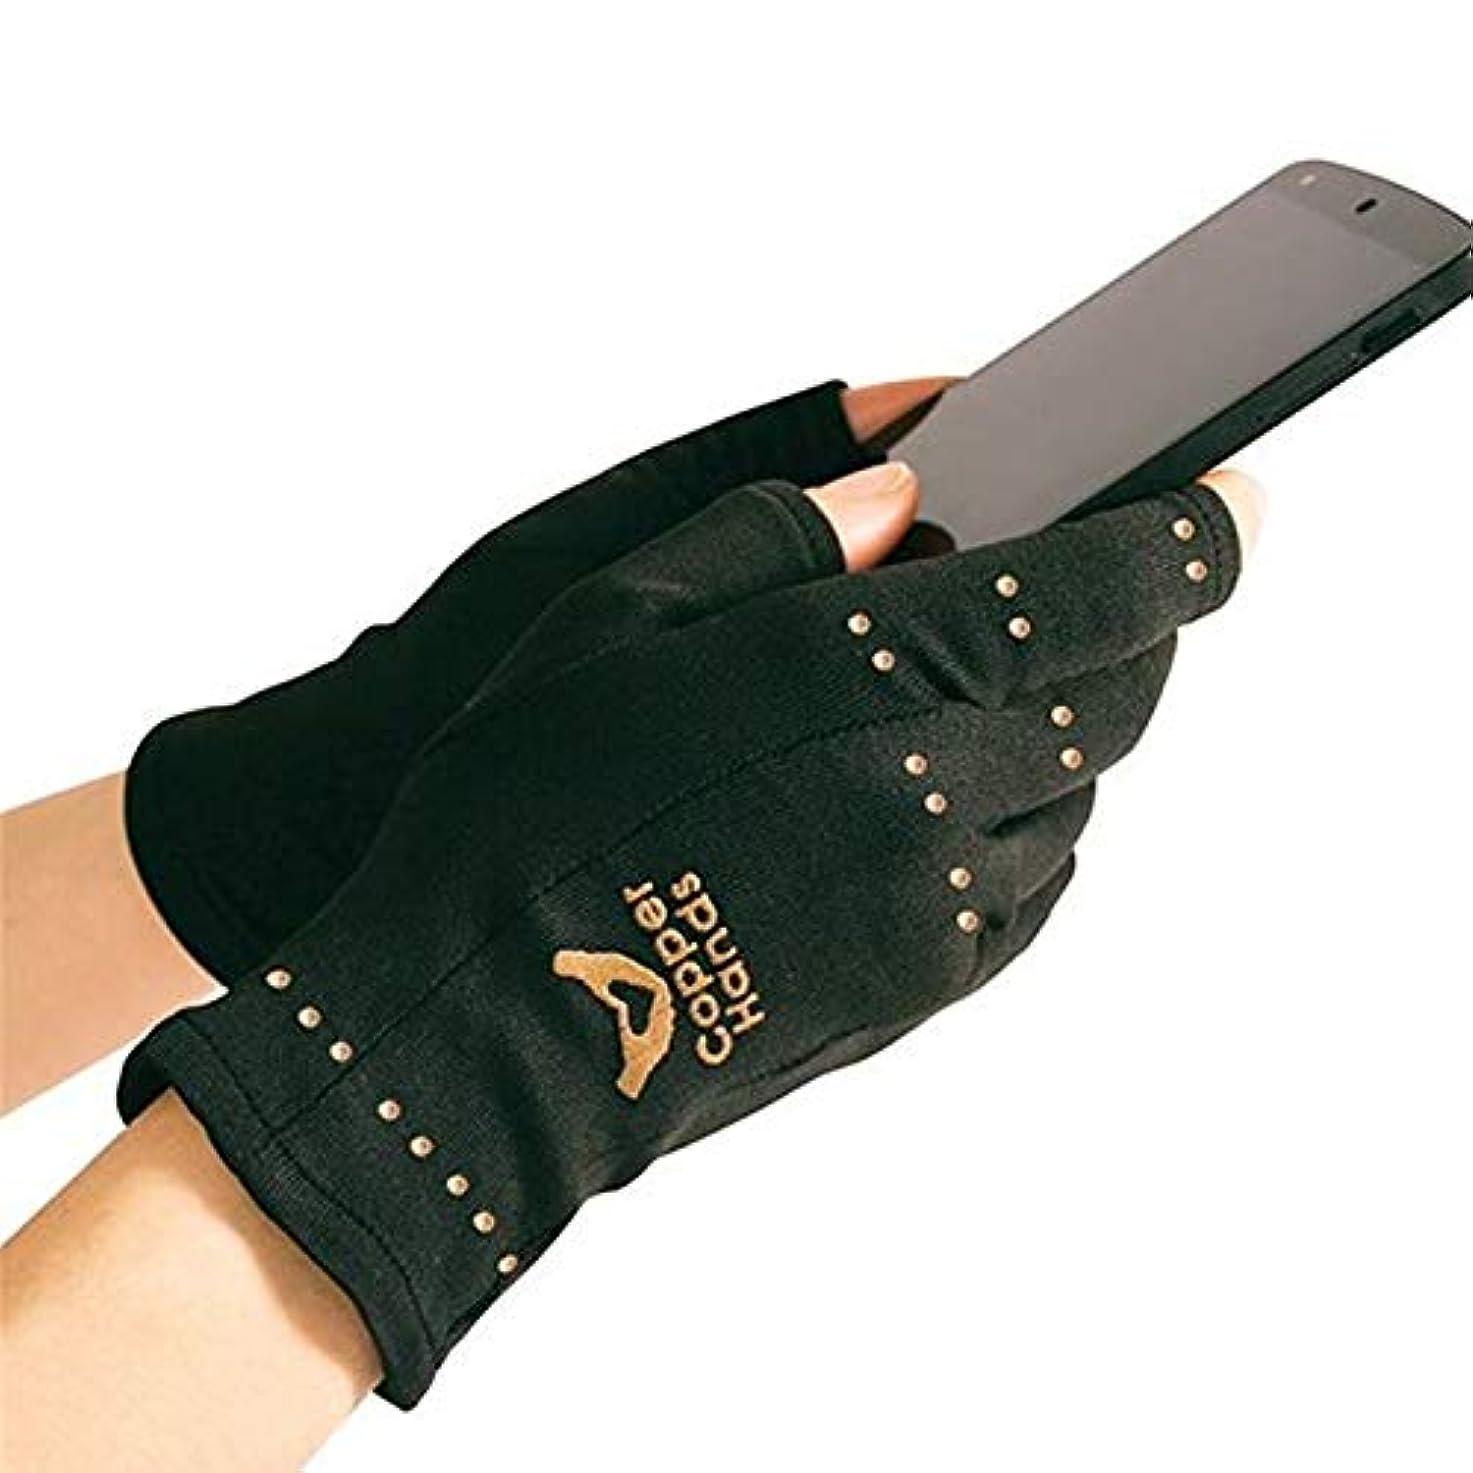 仕事に行く方法リマhapler 磁気療法手袋 磁気手袋 通気性 抗浮腫 関節炎手袋 関節炎着圧手袋 1ペア指なし手袋 関節炎解消 リウマチ性手痛 健康増進療法 手痛緩和手袋 男女通気性良い